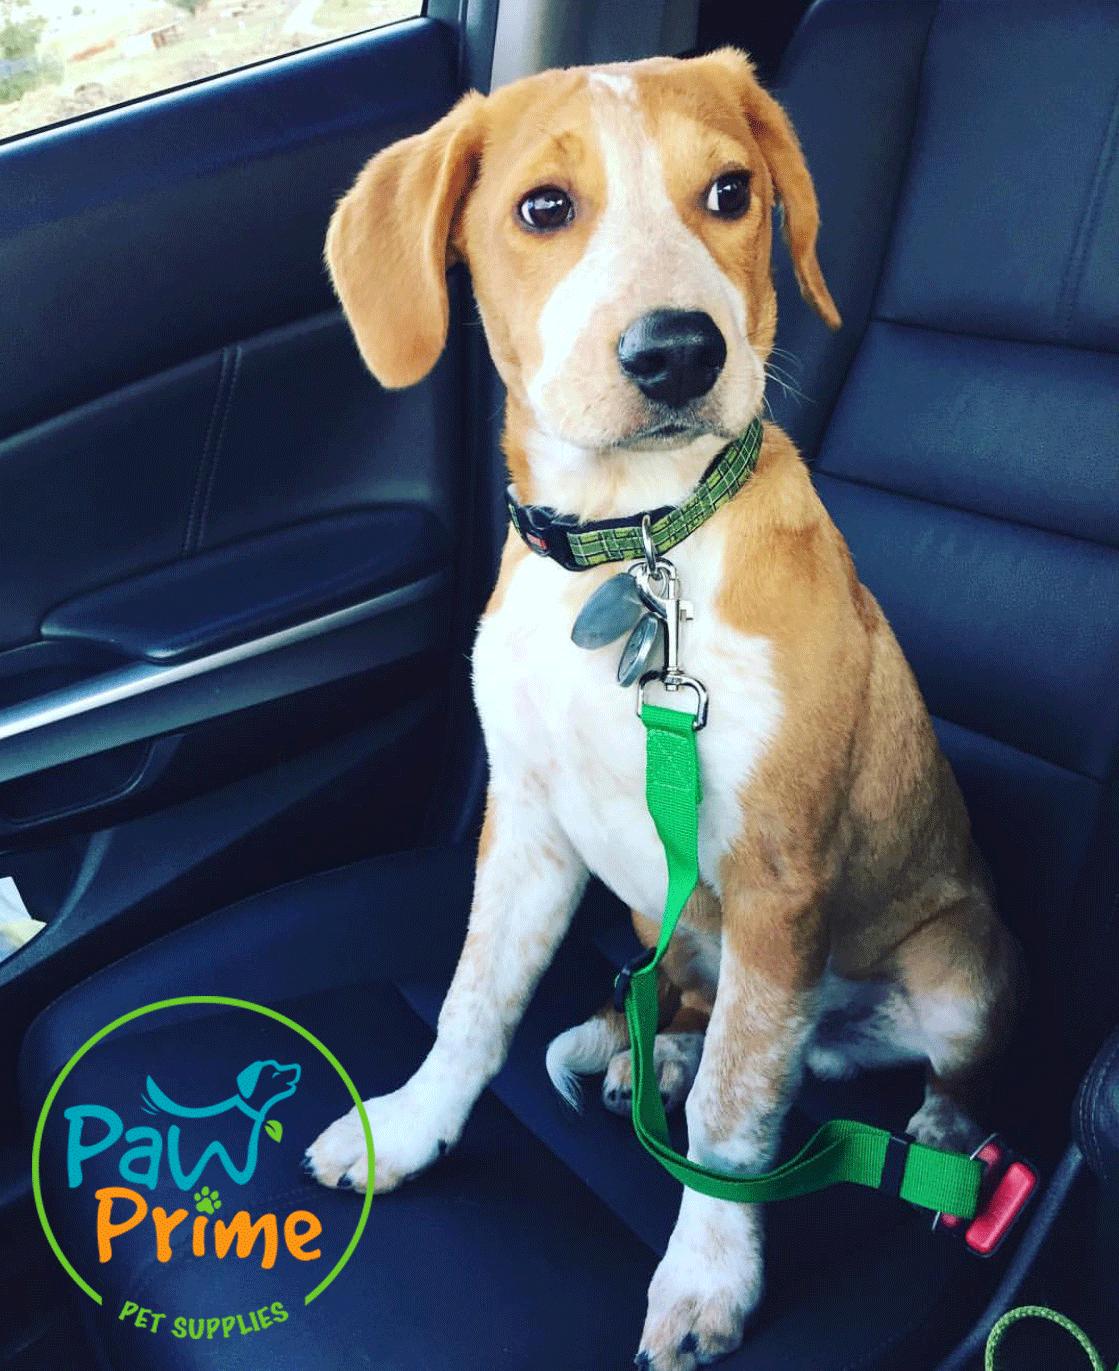 Paw Prime's Doggy Seatbelt's Dog stroller, Dog bike